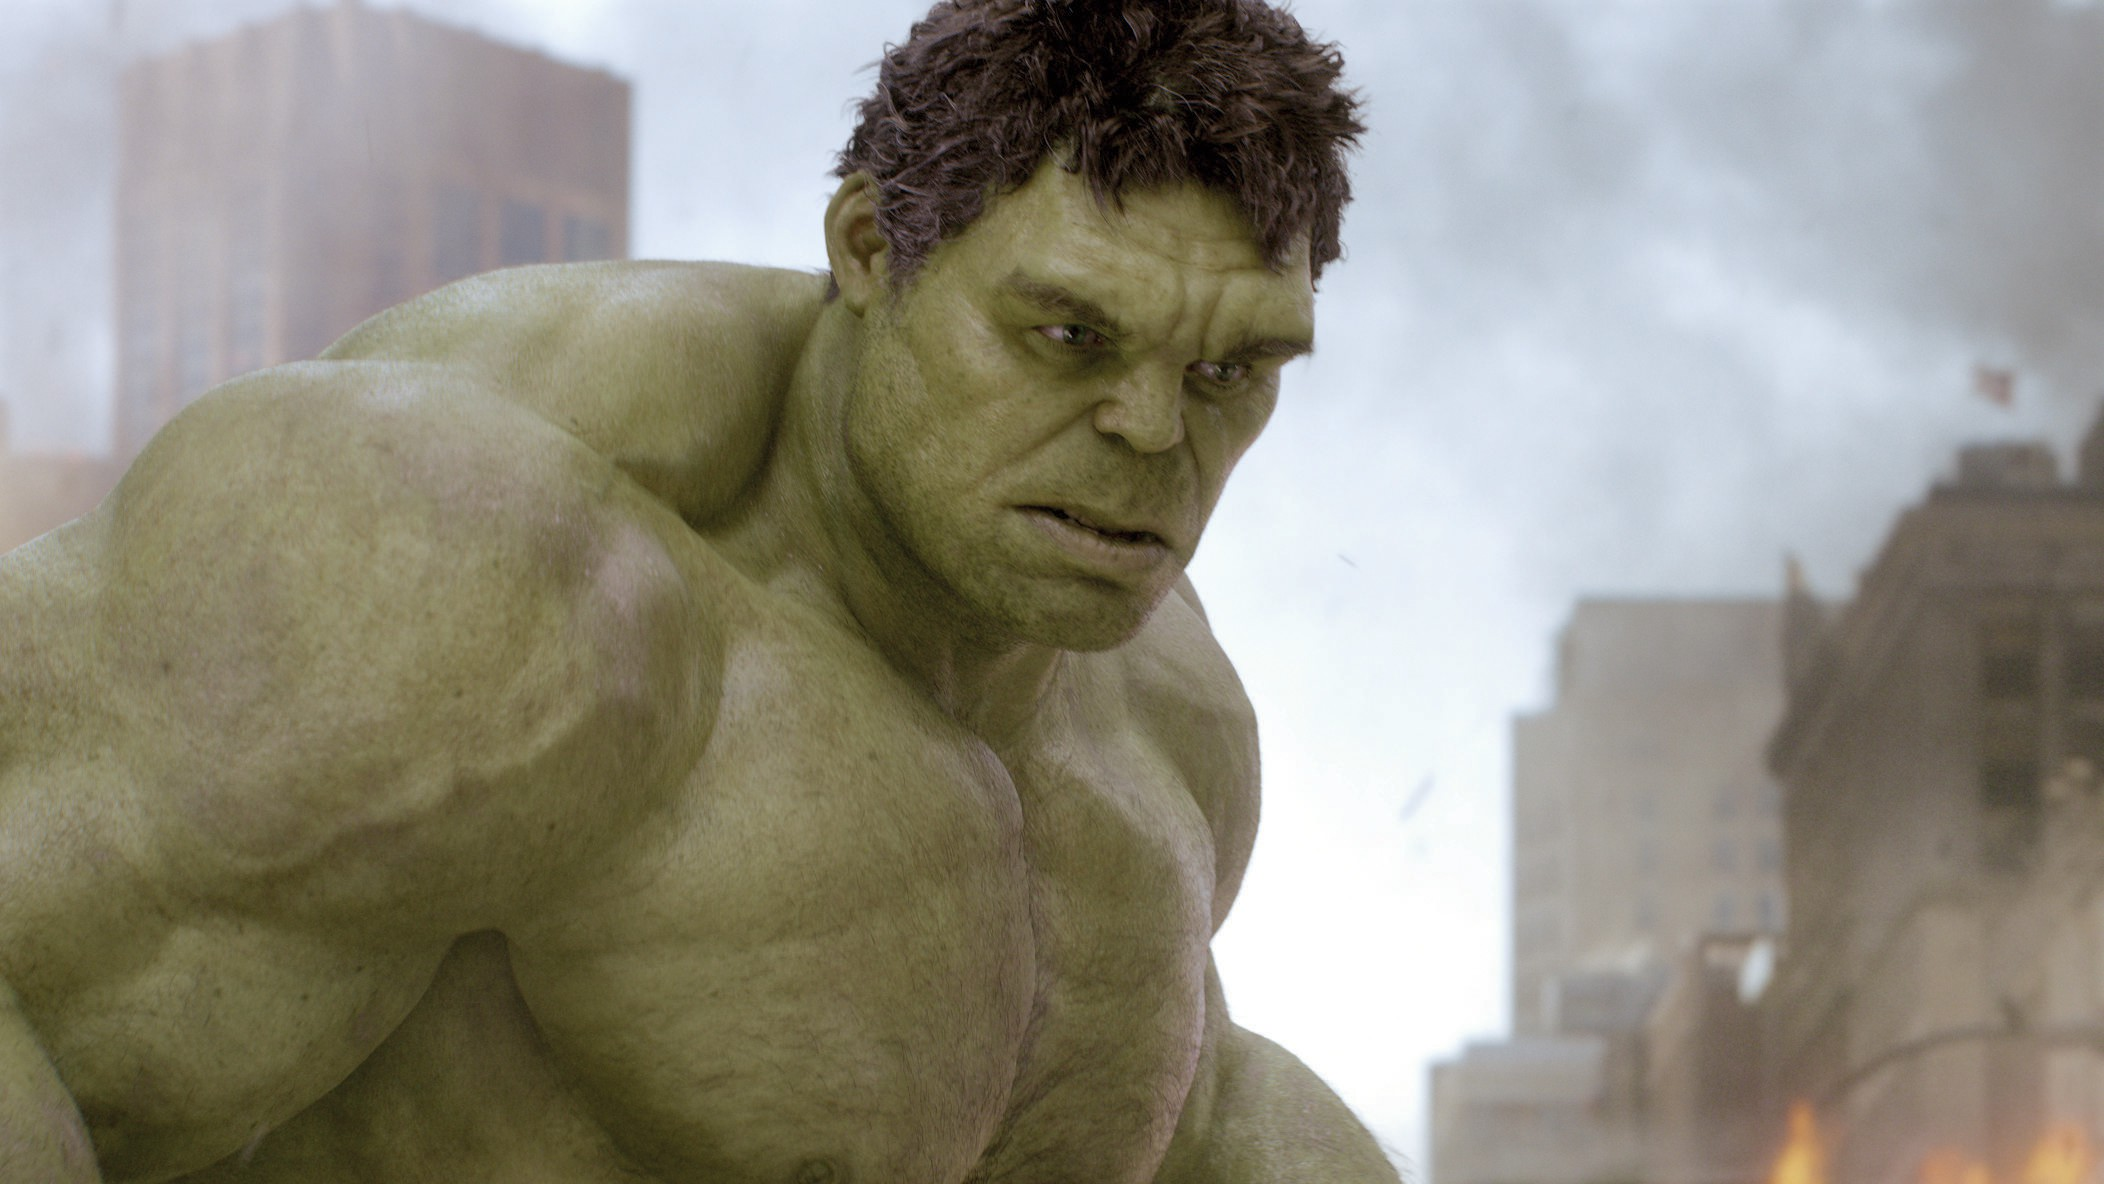 Los Vengadores se estrenara en 3D-hulk_face.jpg